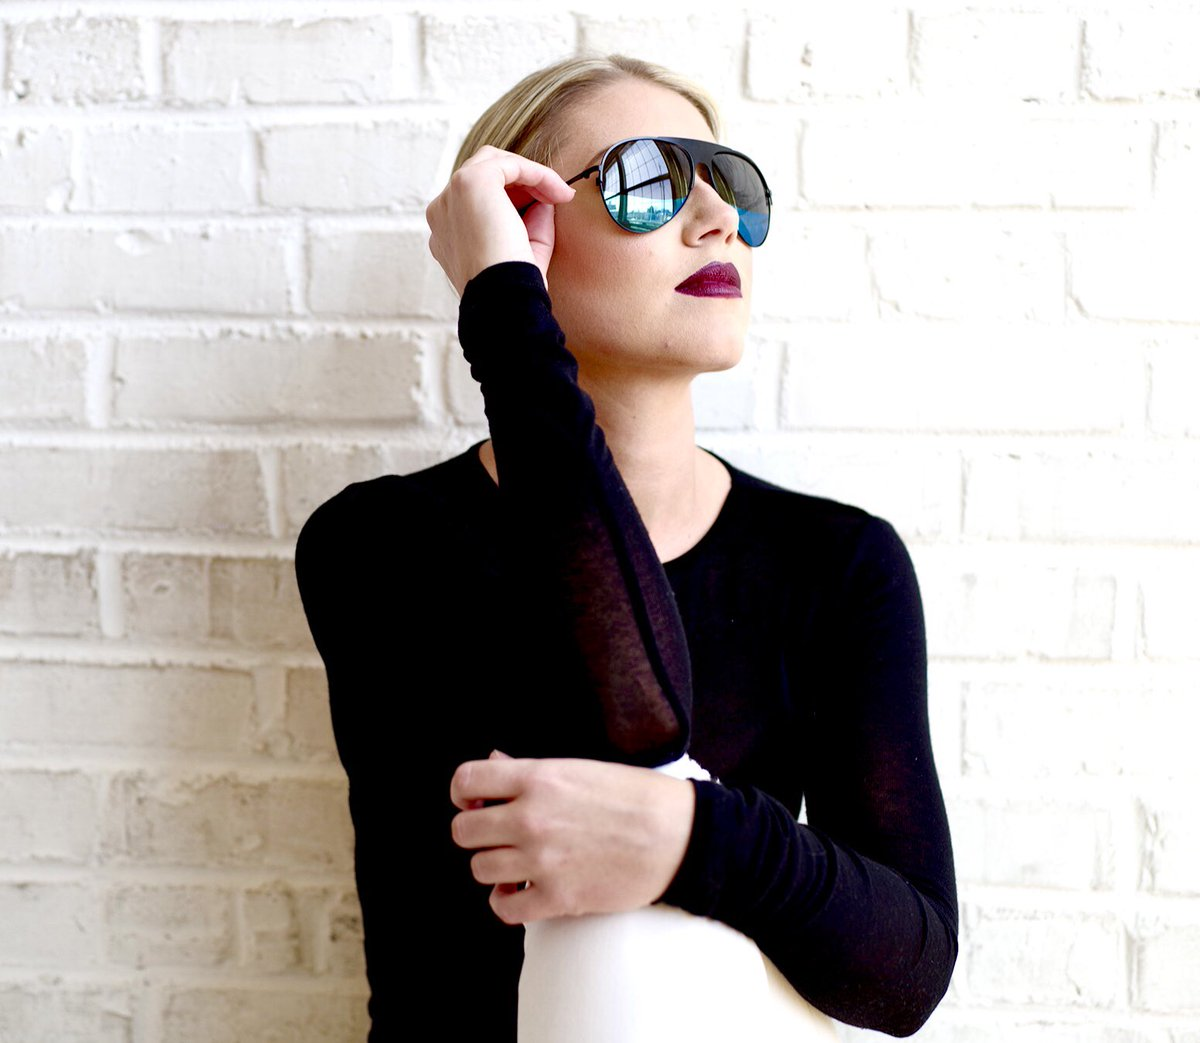 Luxury eyewear inspired by nature's hidden beauty: black & blue eyes of the Blue Damselfly. #SeeBeyond🕶  #vulishades #eyewear #eyehealth #uvprotection #polarized #damselfly #insects #inspiration #lenses #blackowned #blue #unisex #sunglasslover #shades #aviators #blonde